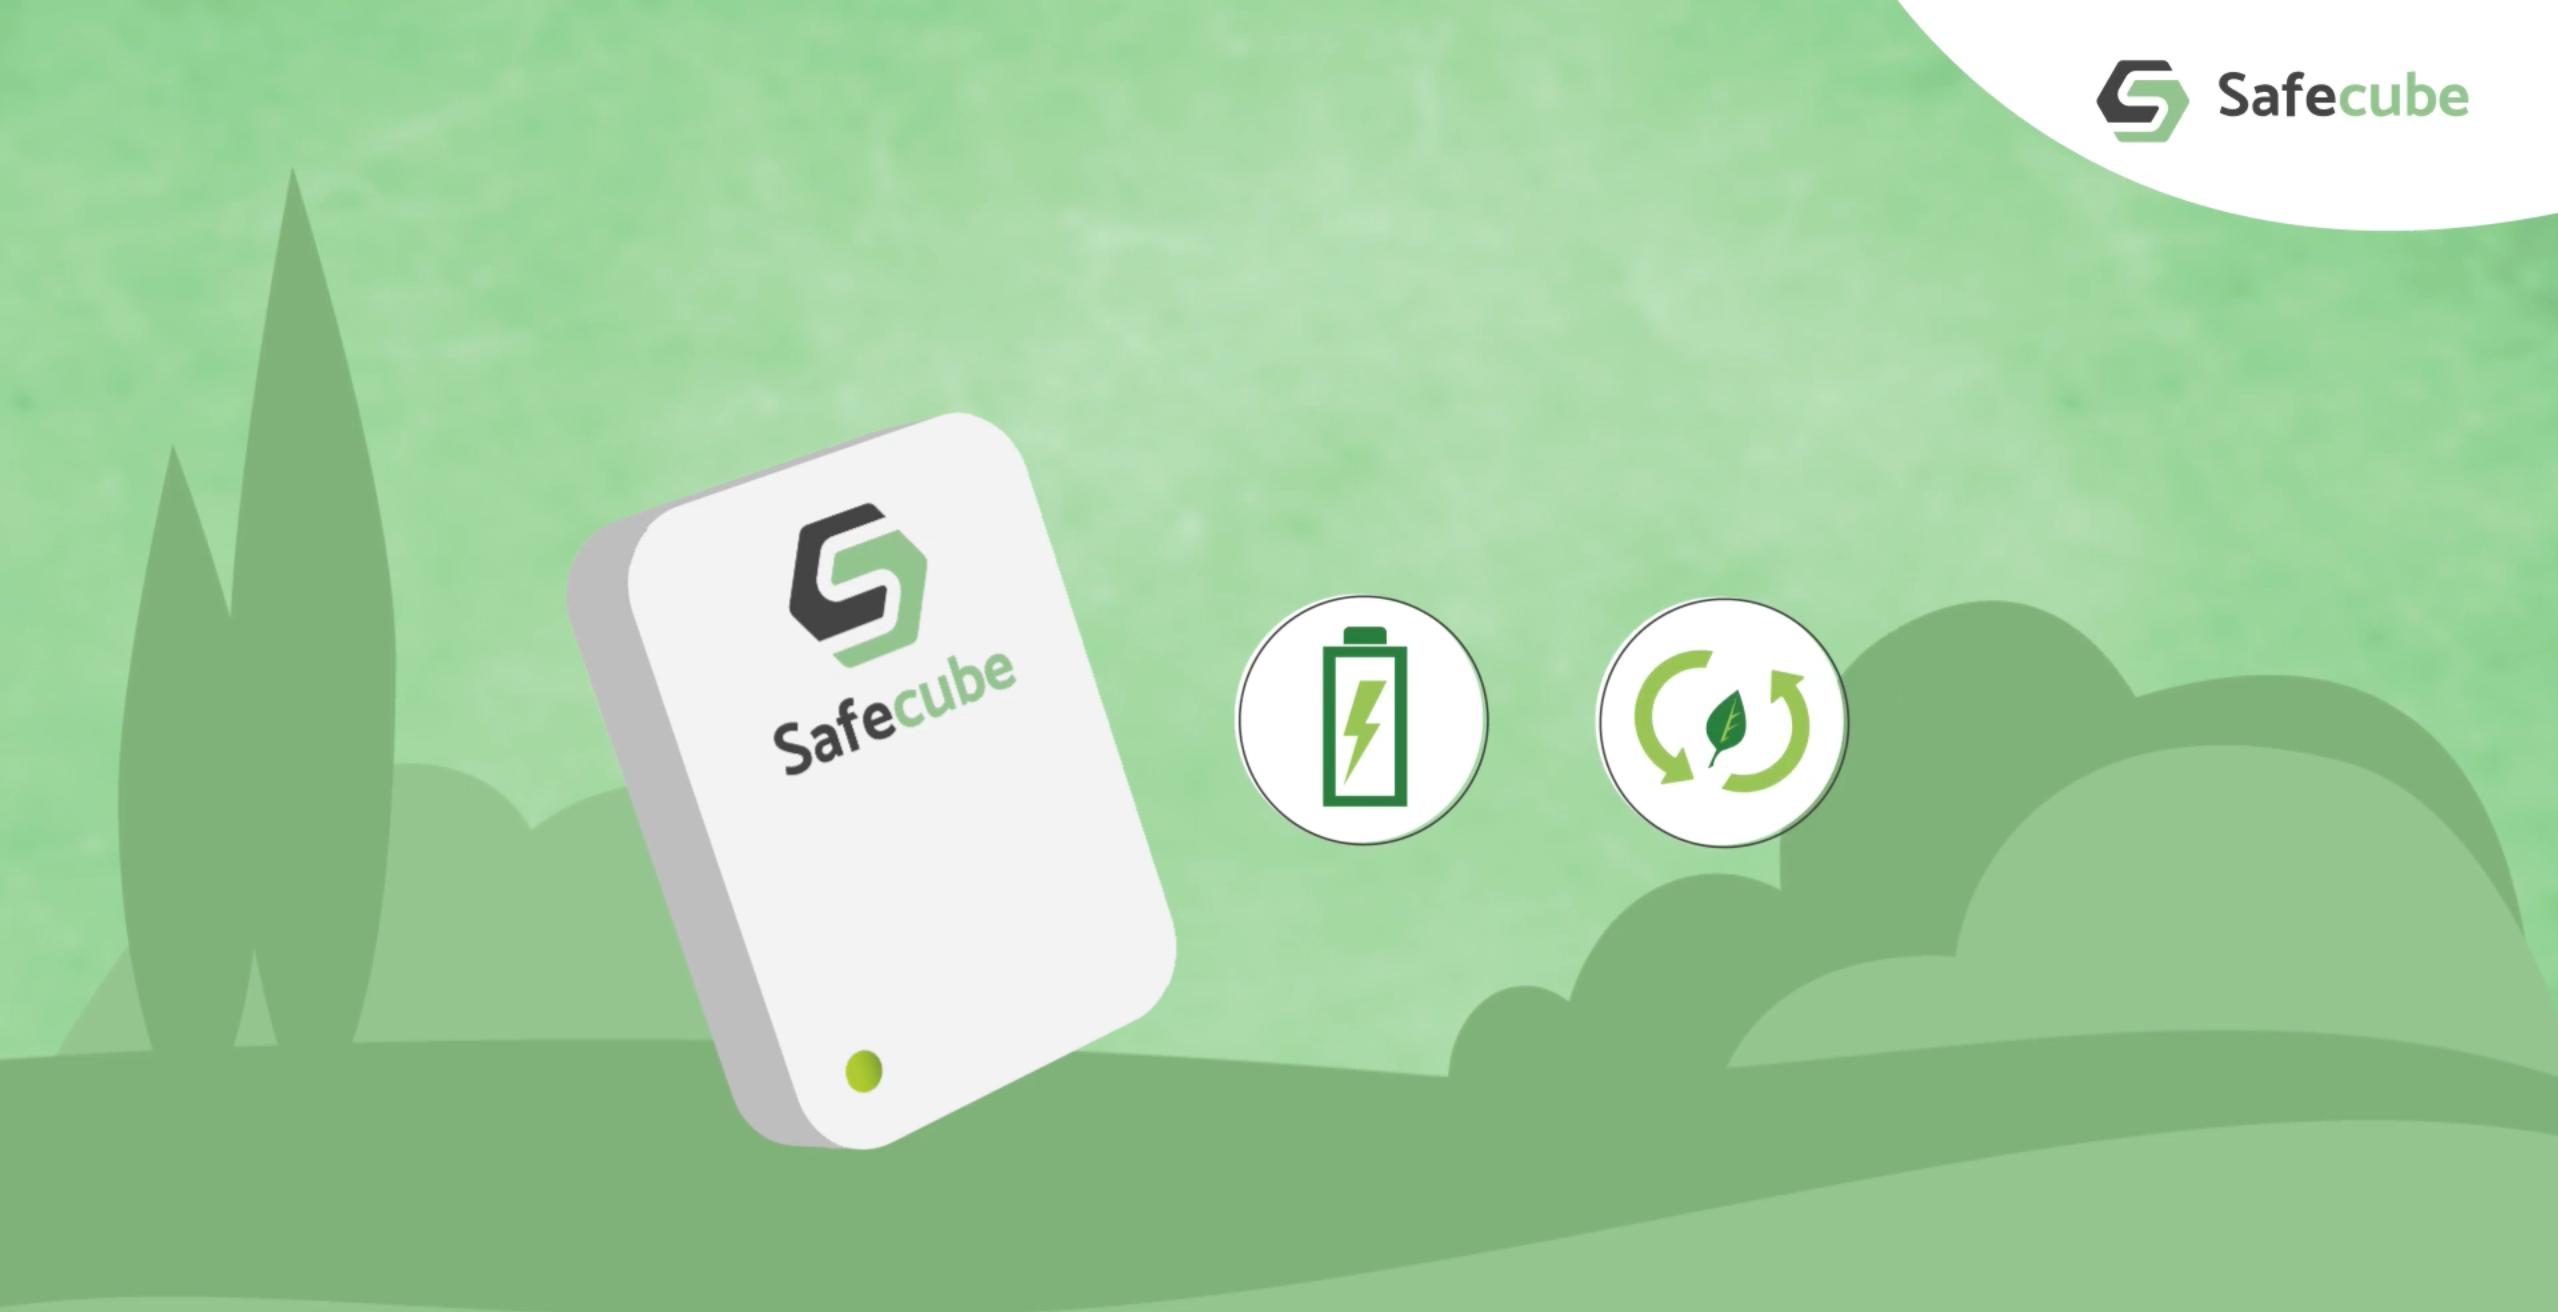 Safecube IoTrack: solución de seguimiento de contenedores de envío global de extremo a extremo